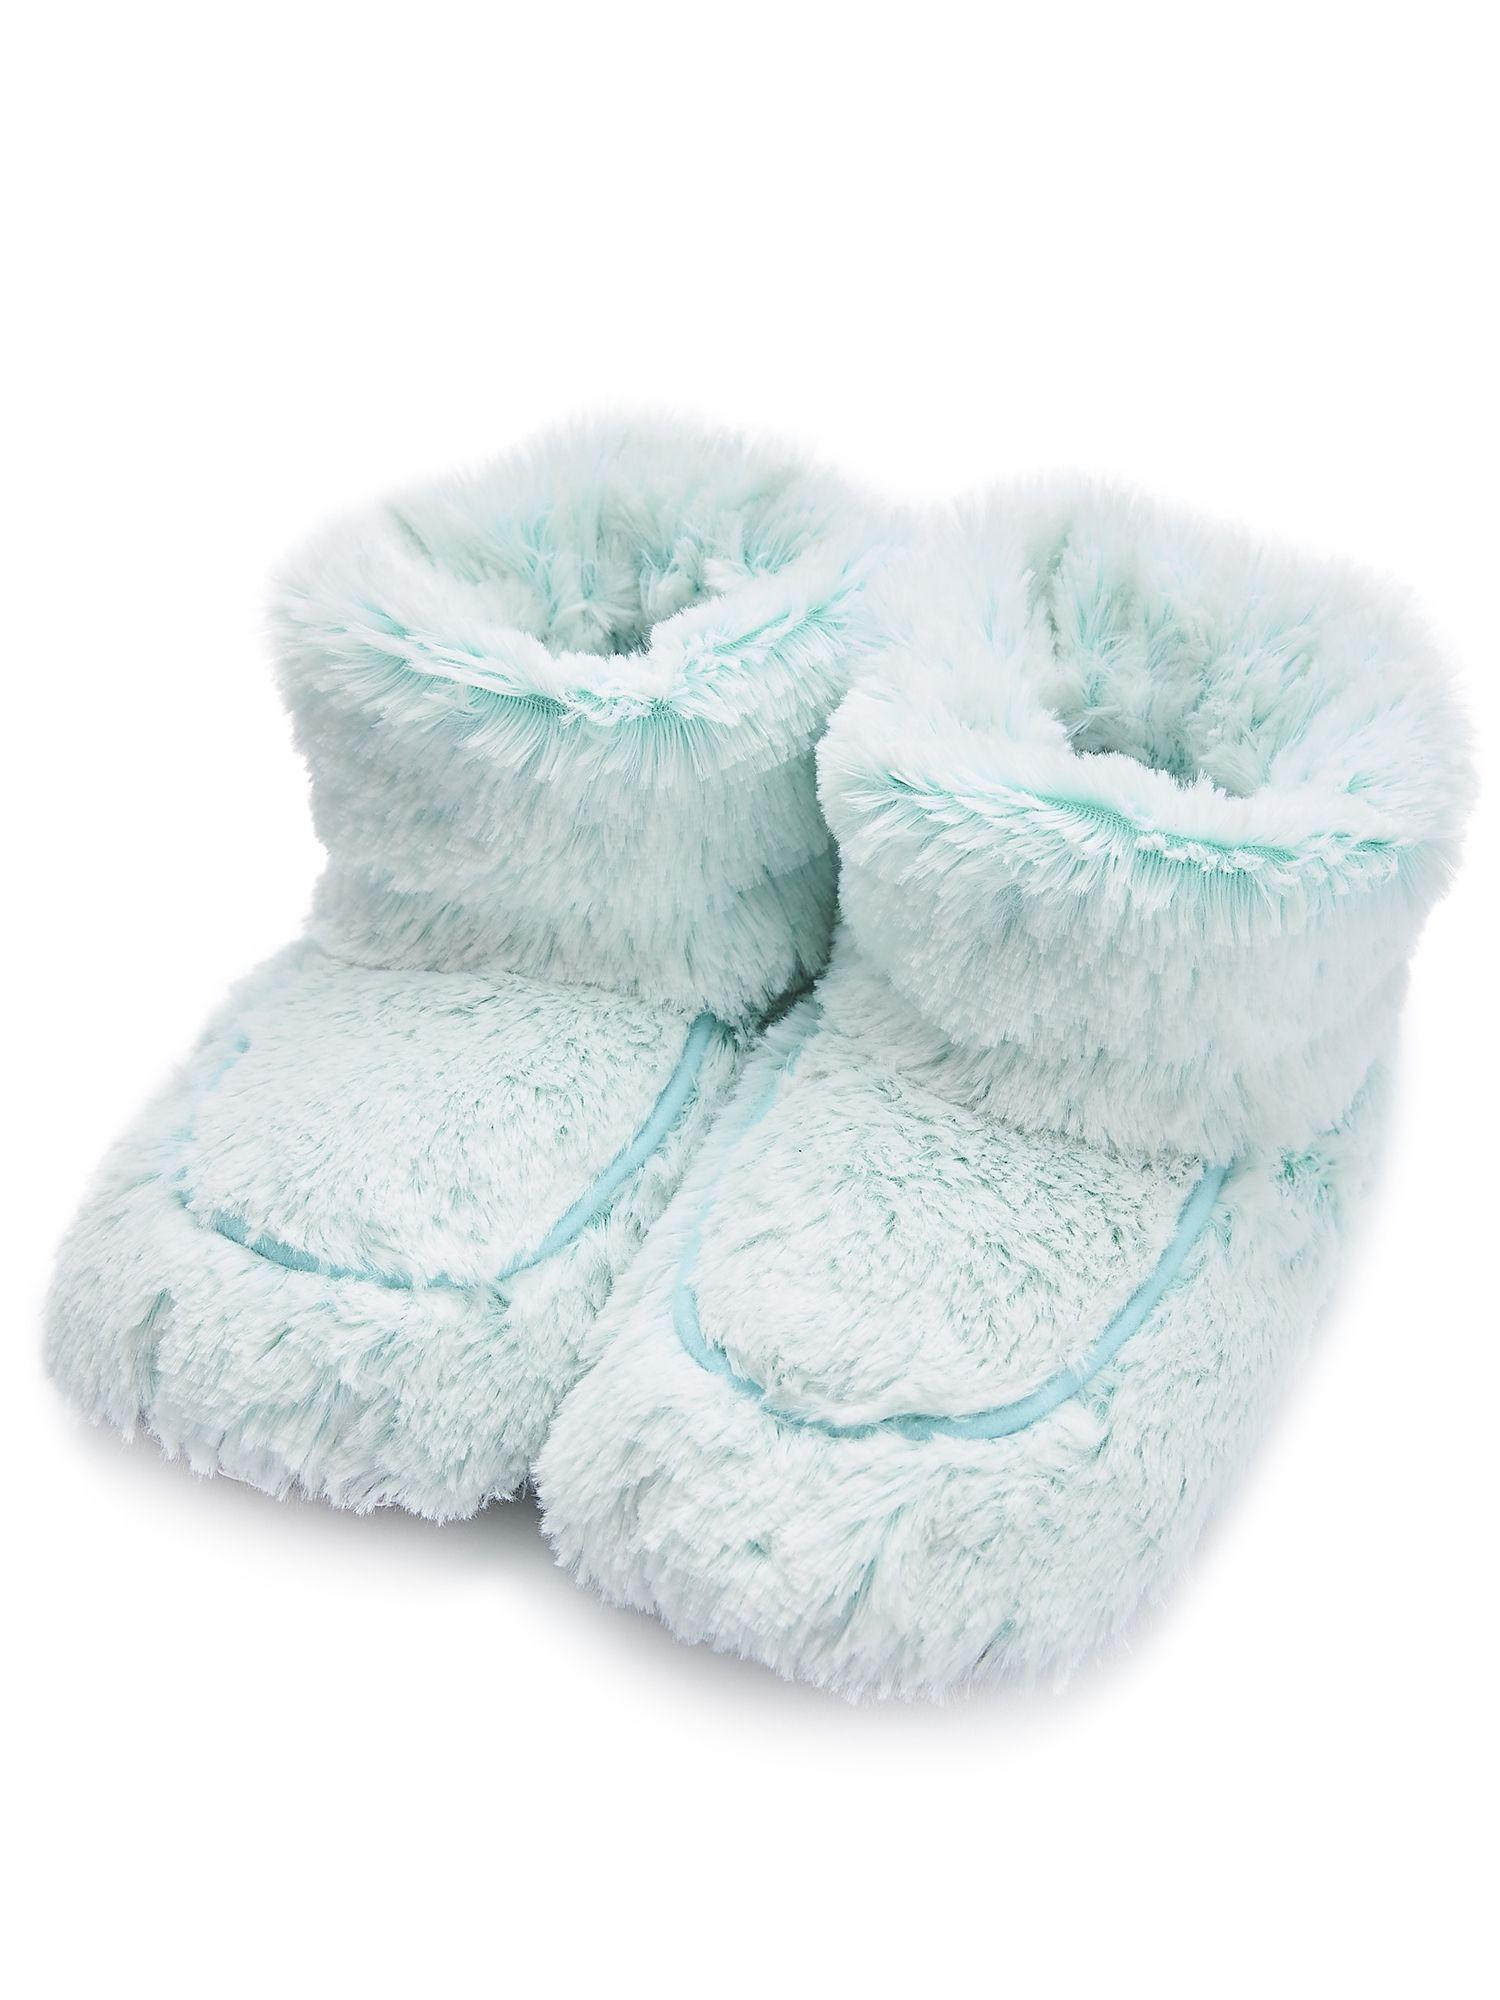 Пинкл (Pinkl) | Сапожки-грелки мятные Marshmallow | Intelex Ltd Warmies Cozy Body Mint Marshmallow Boots